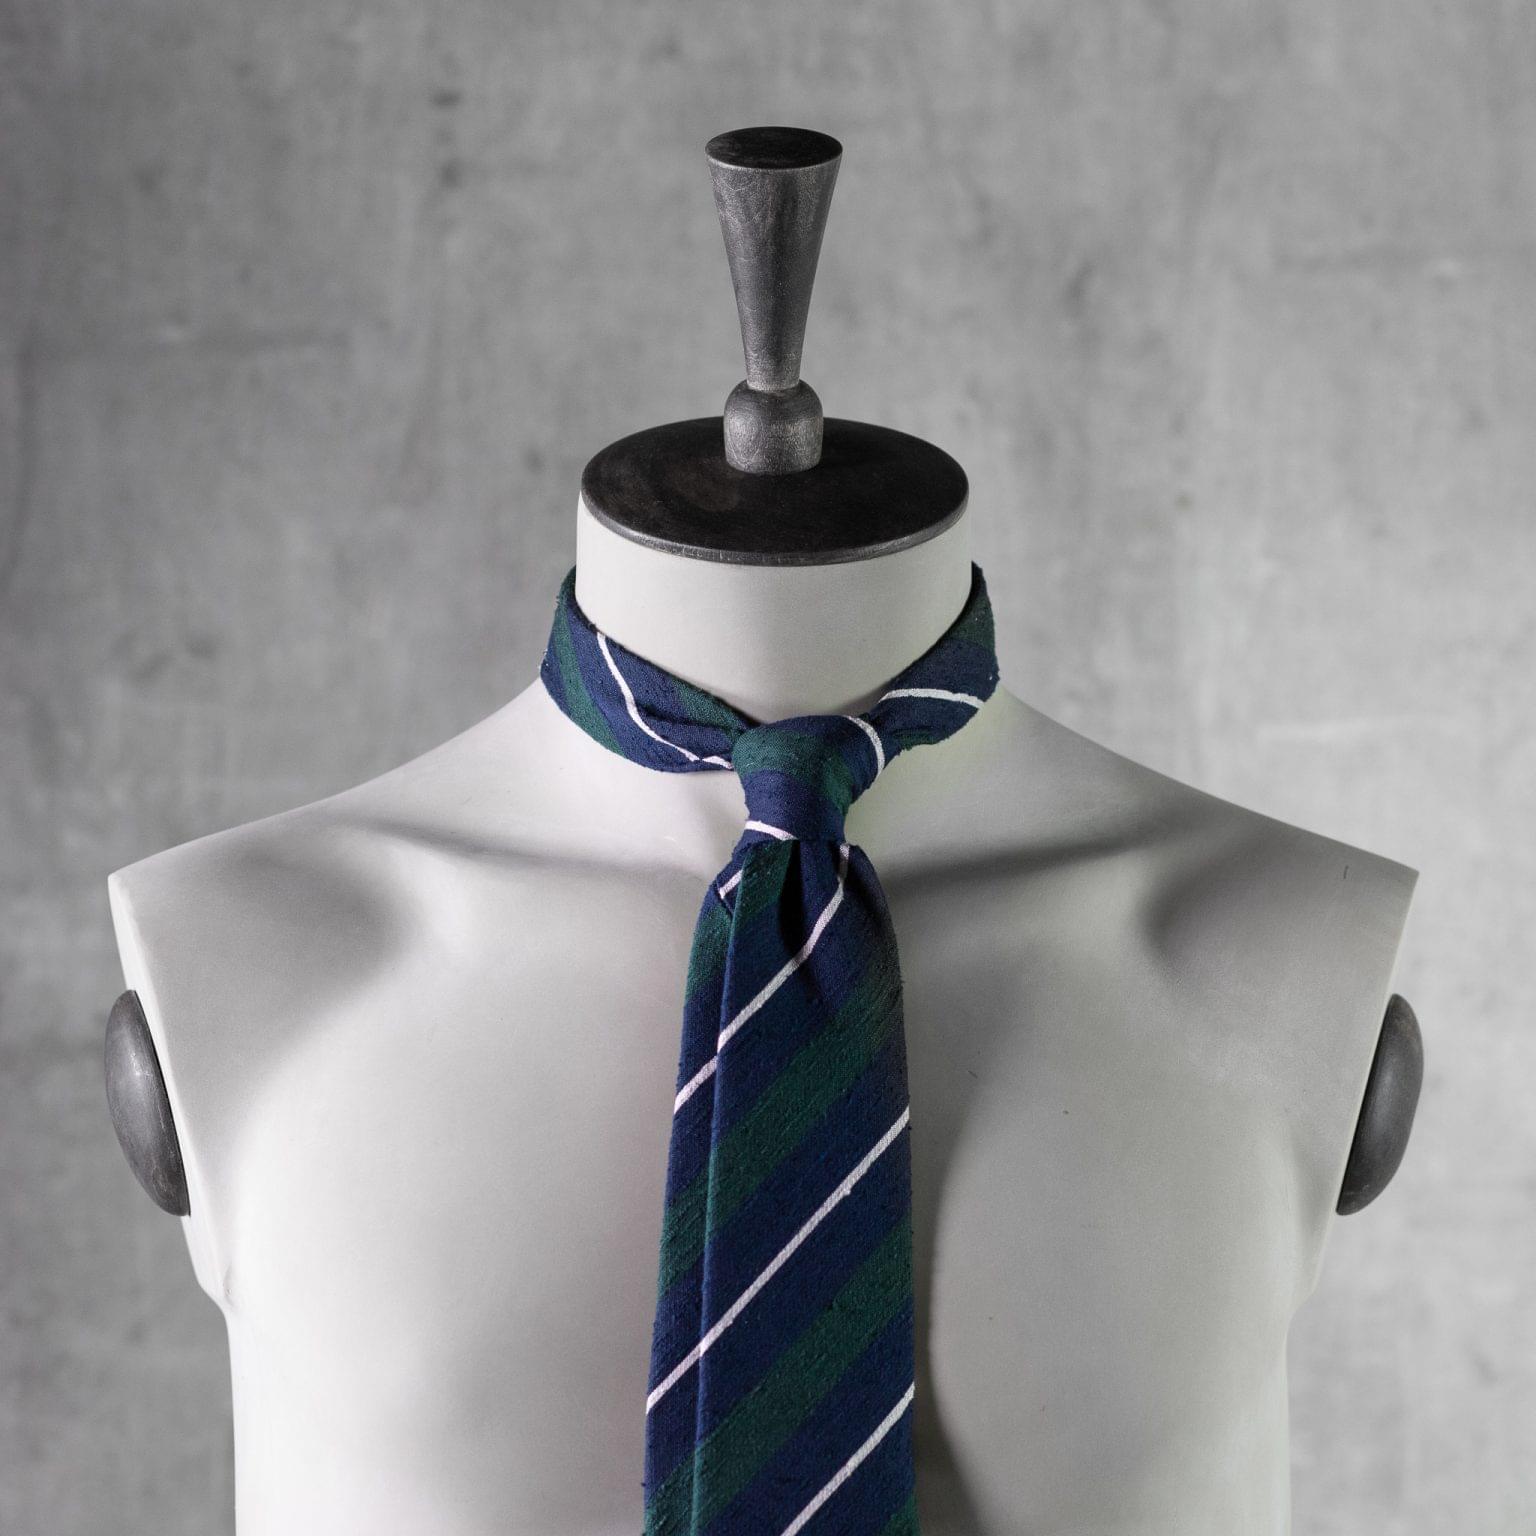 SHANTUNG-0526-Tie-Initials-Corbata-Iniciales-The-Seelk-3